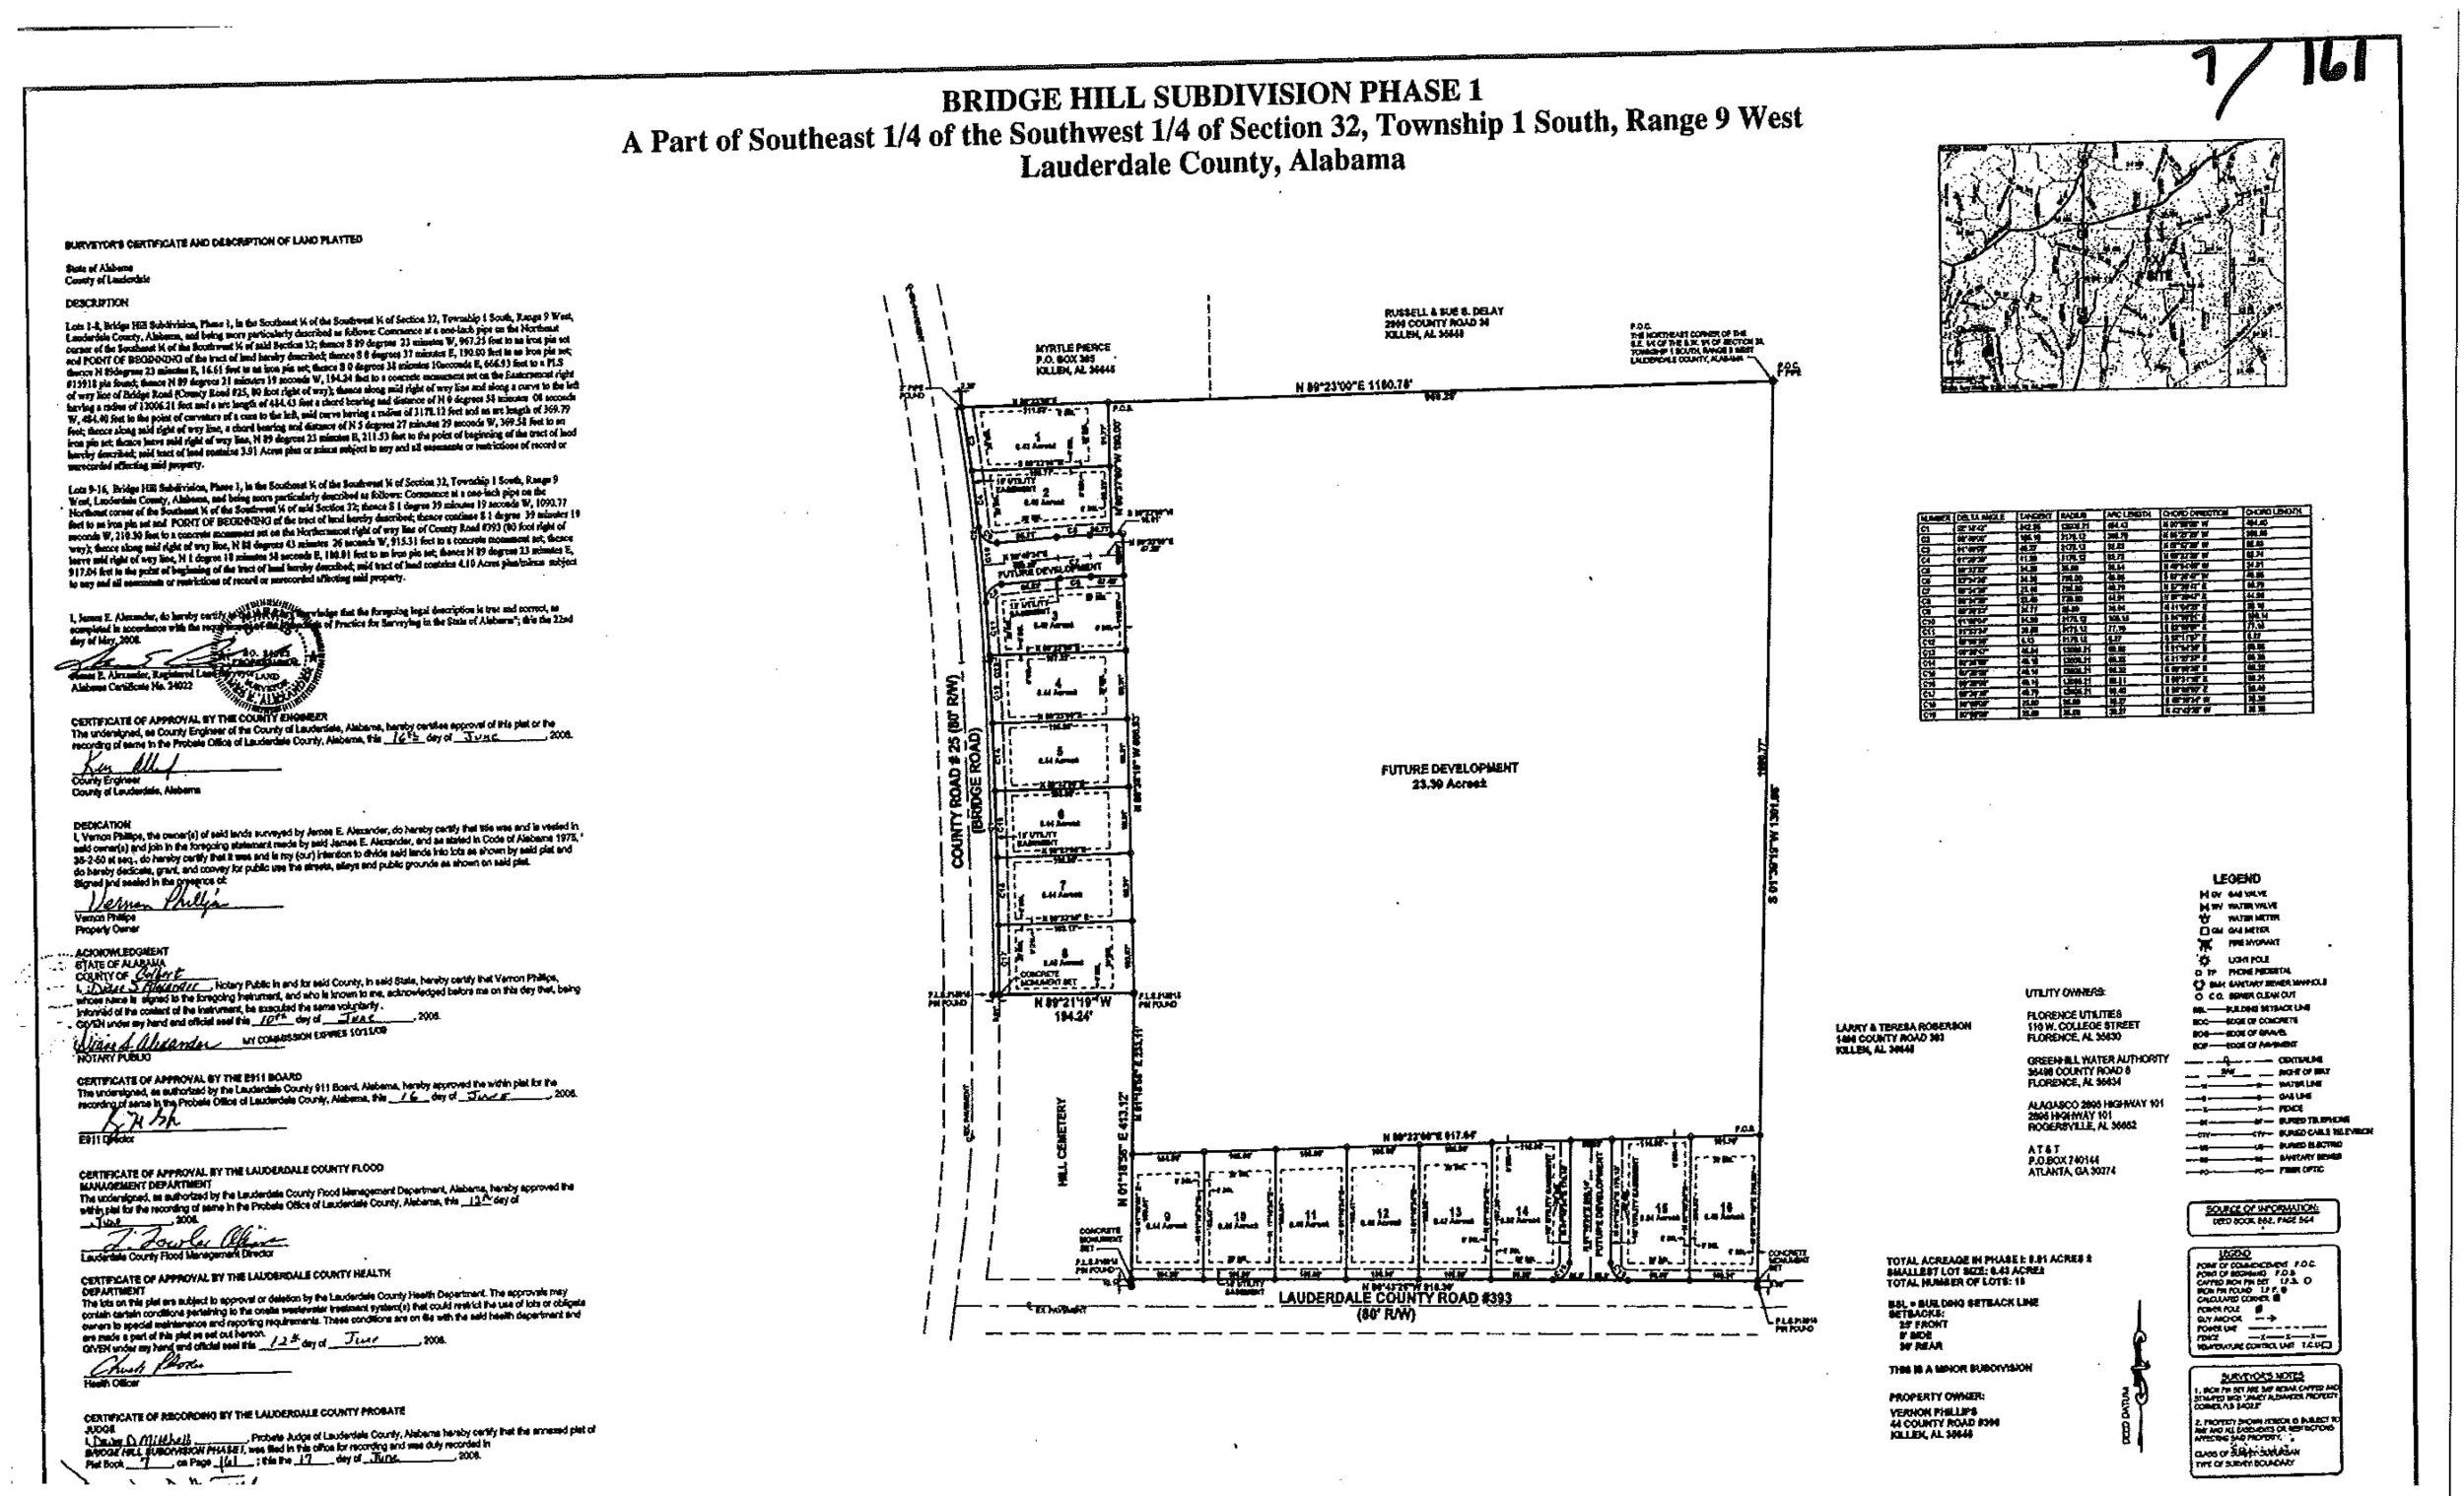 bridge hill (phase 1) plats-1.jpg